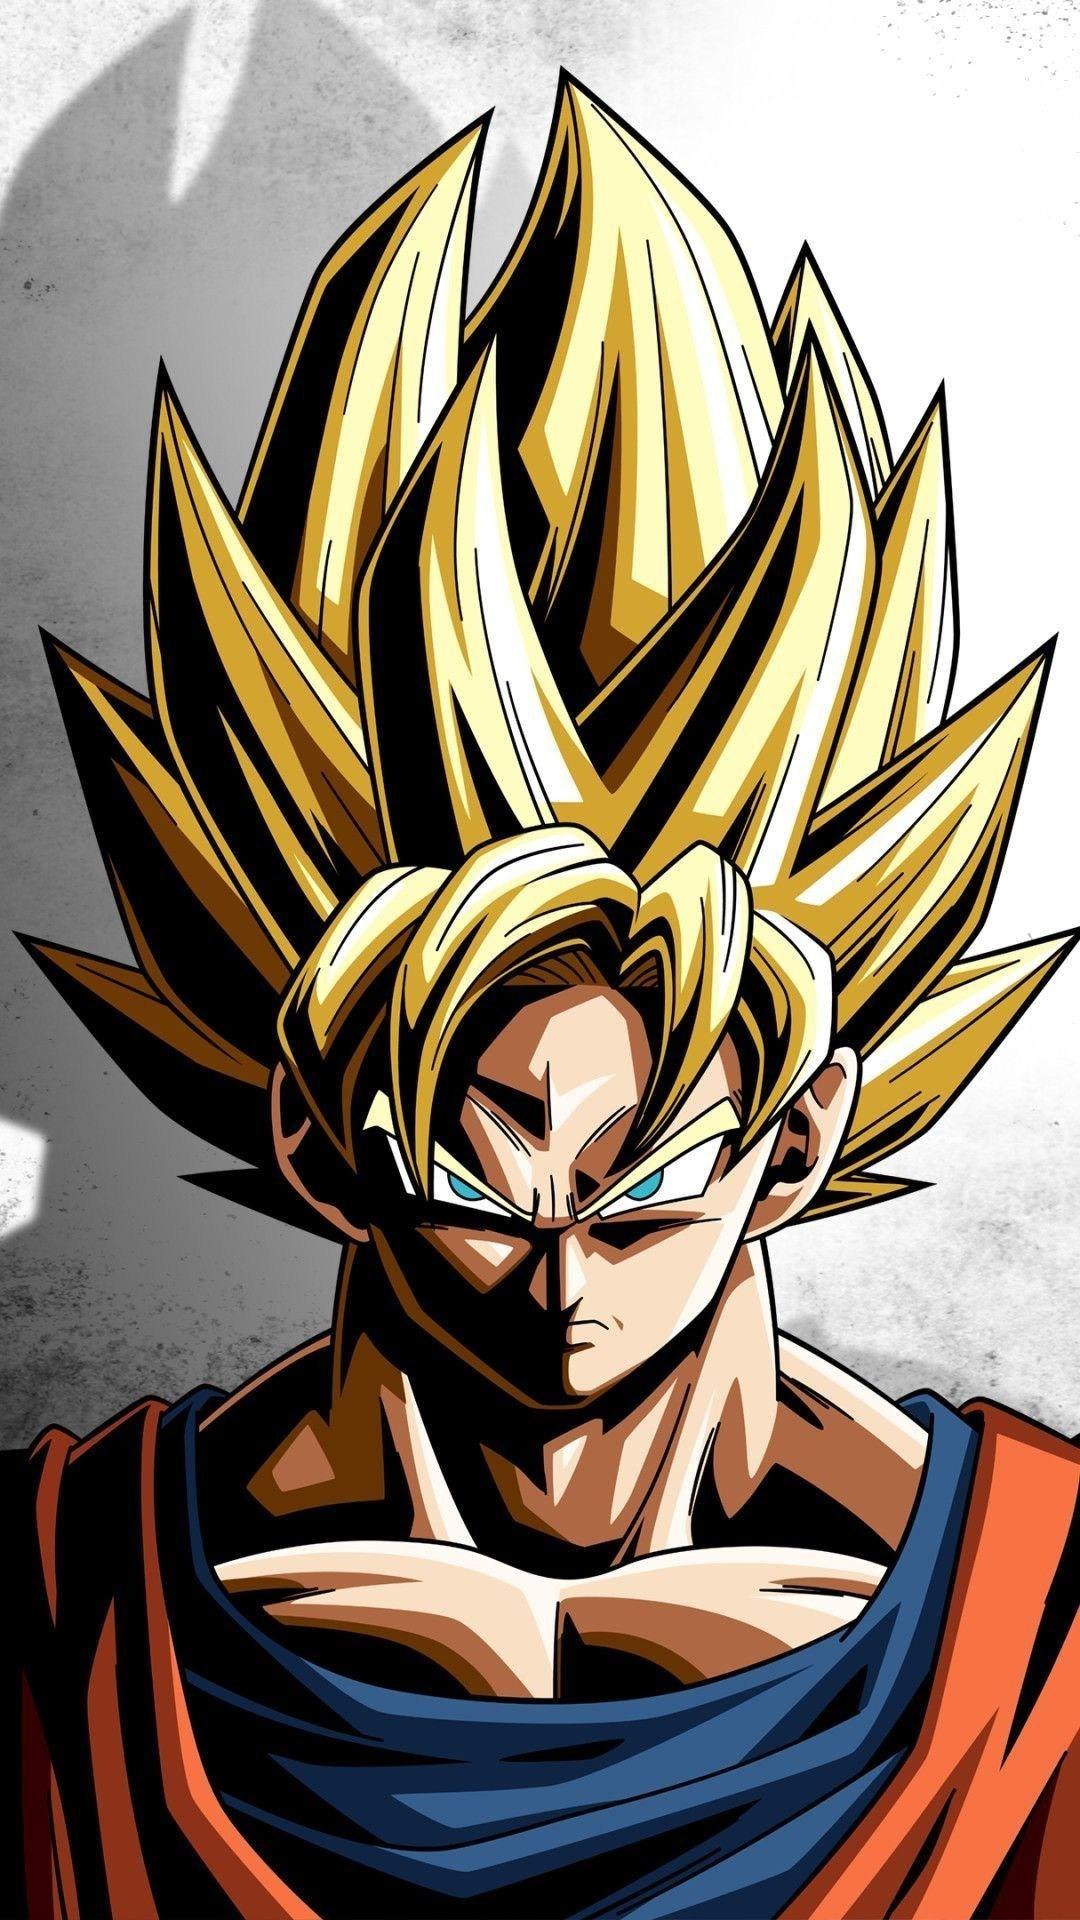 Goku Super Saiyan 4 Wallpaper #4S7MJQP (1920x1080 px) .